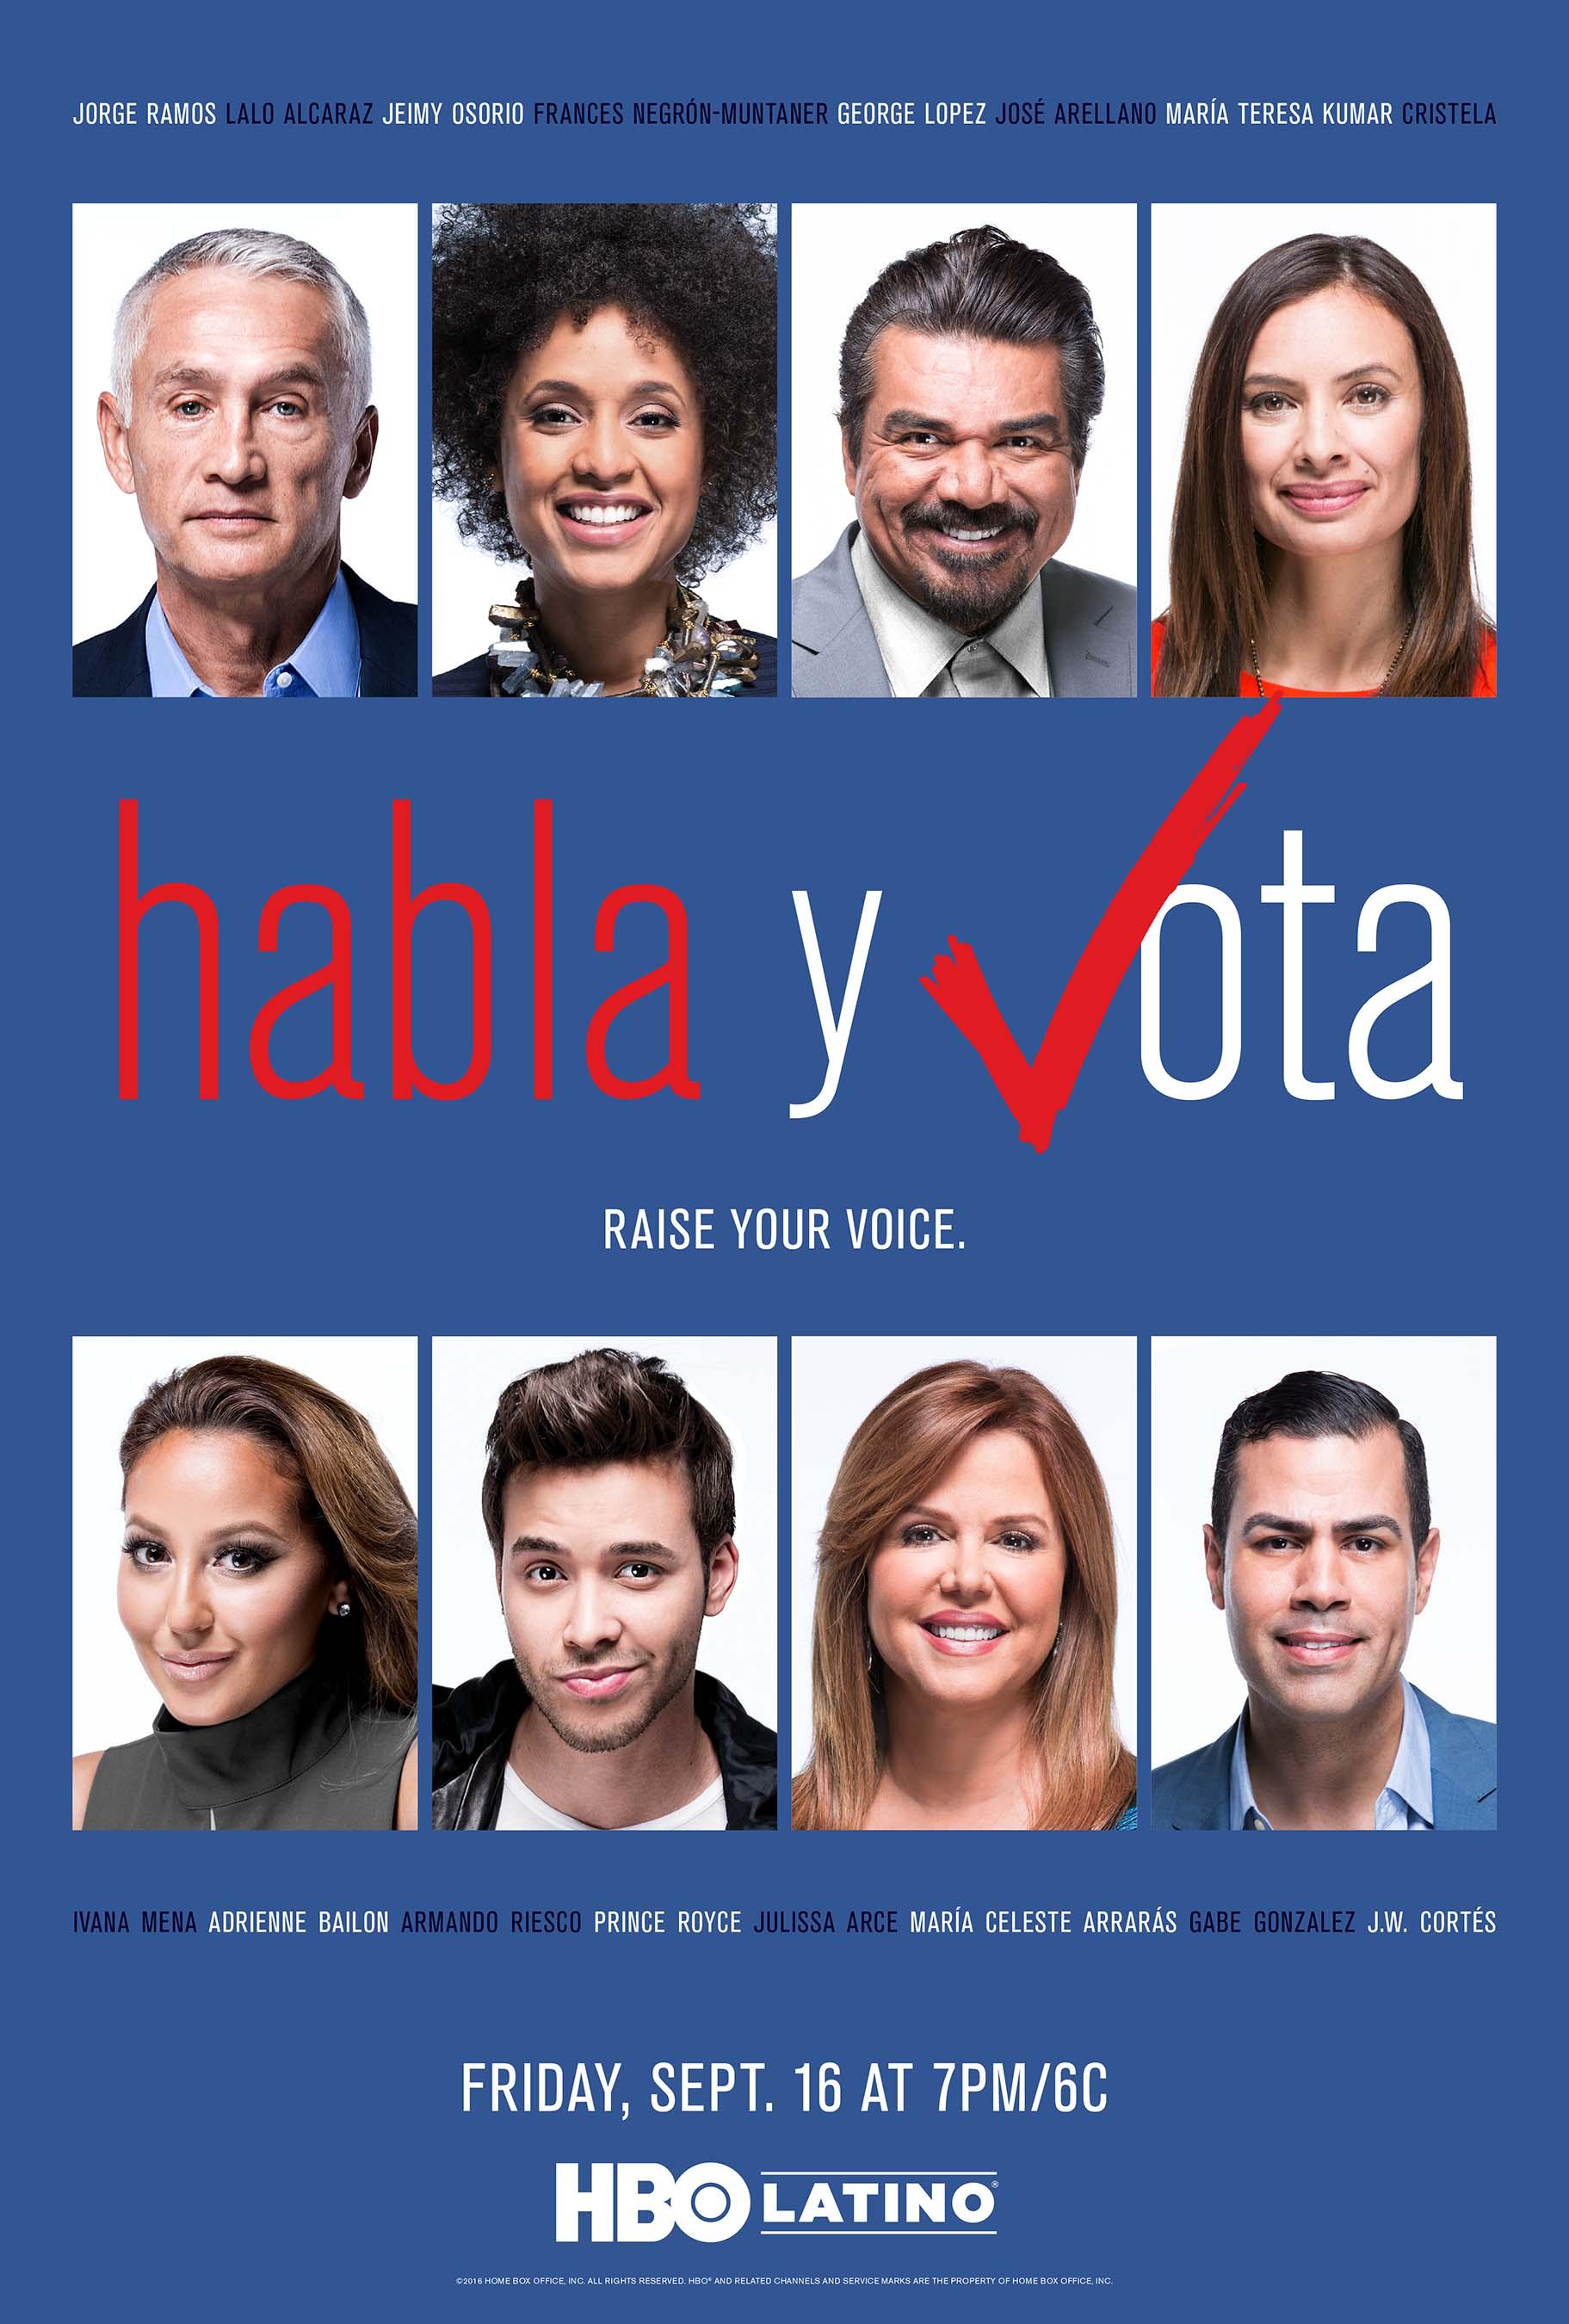 Habla y Vota Key Art